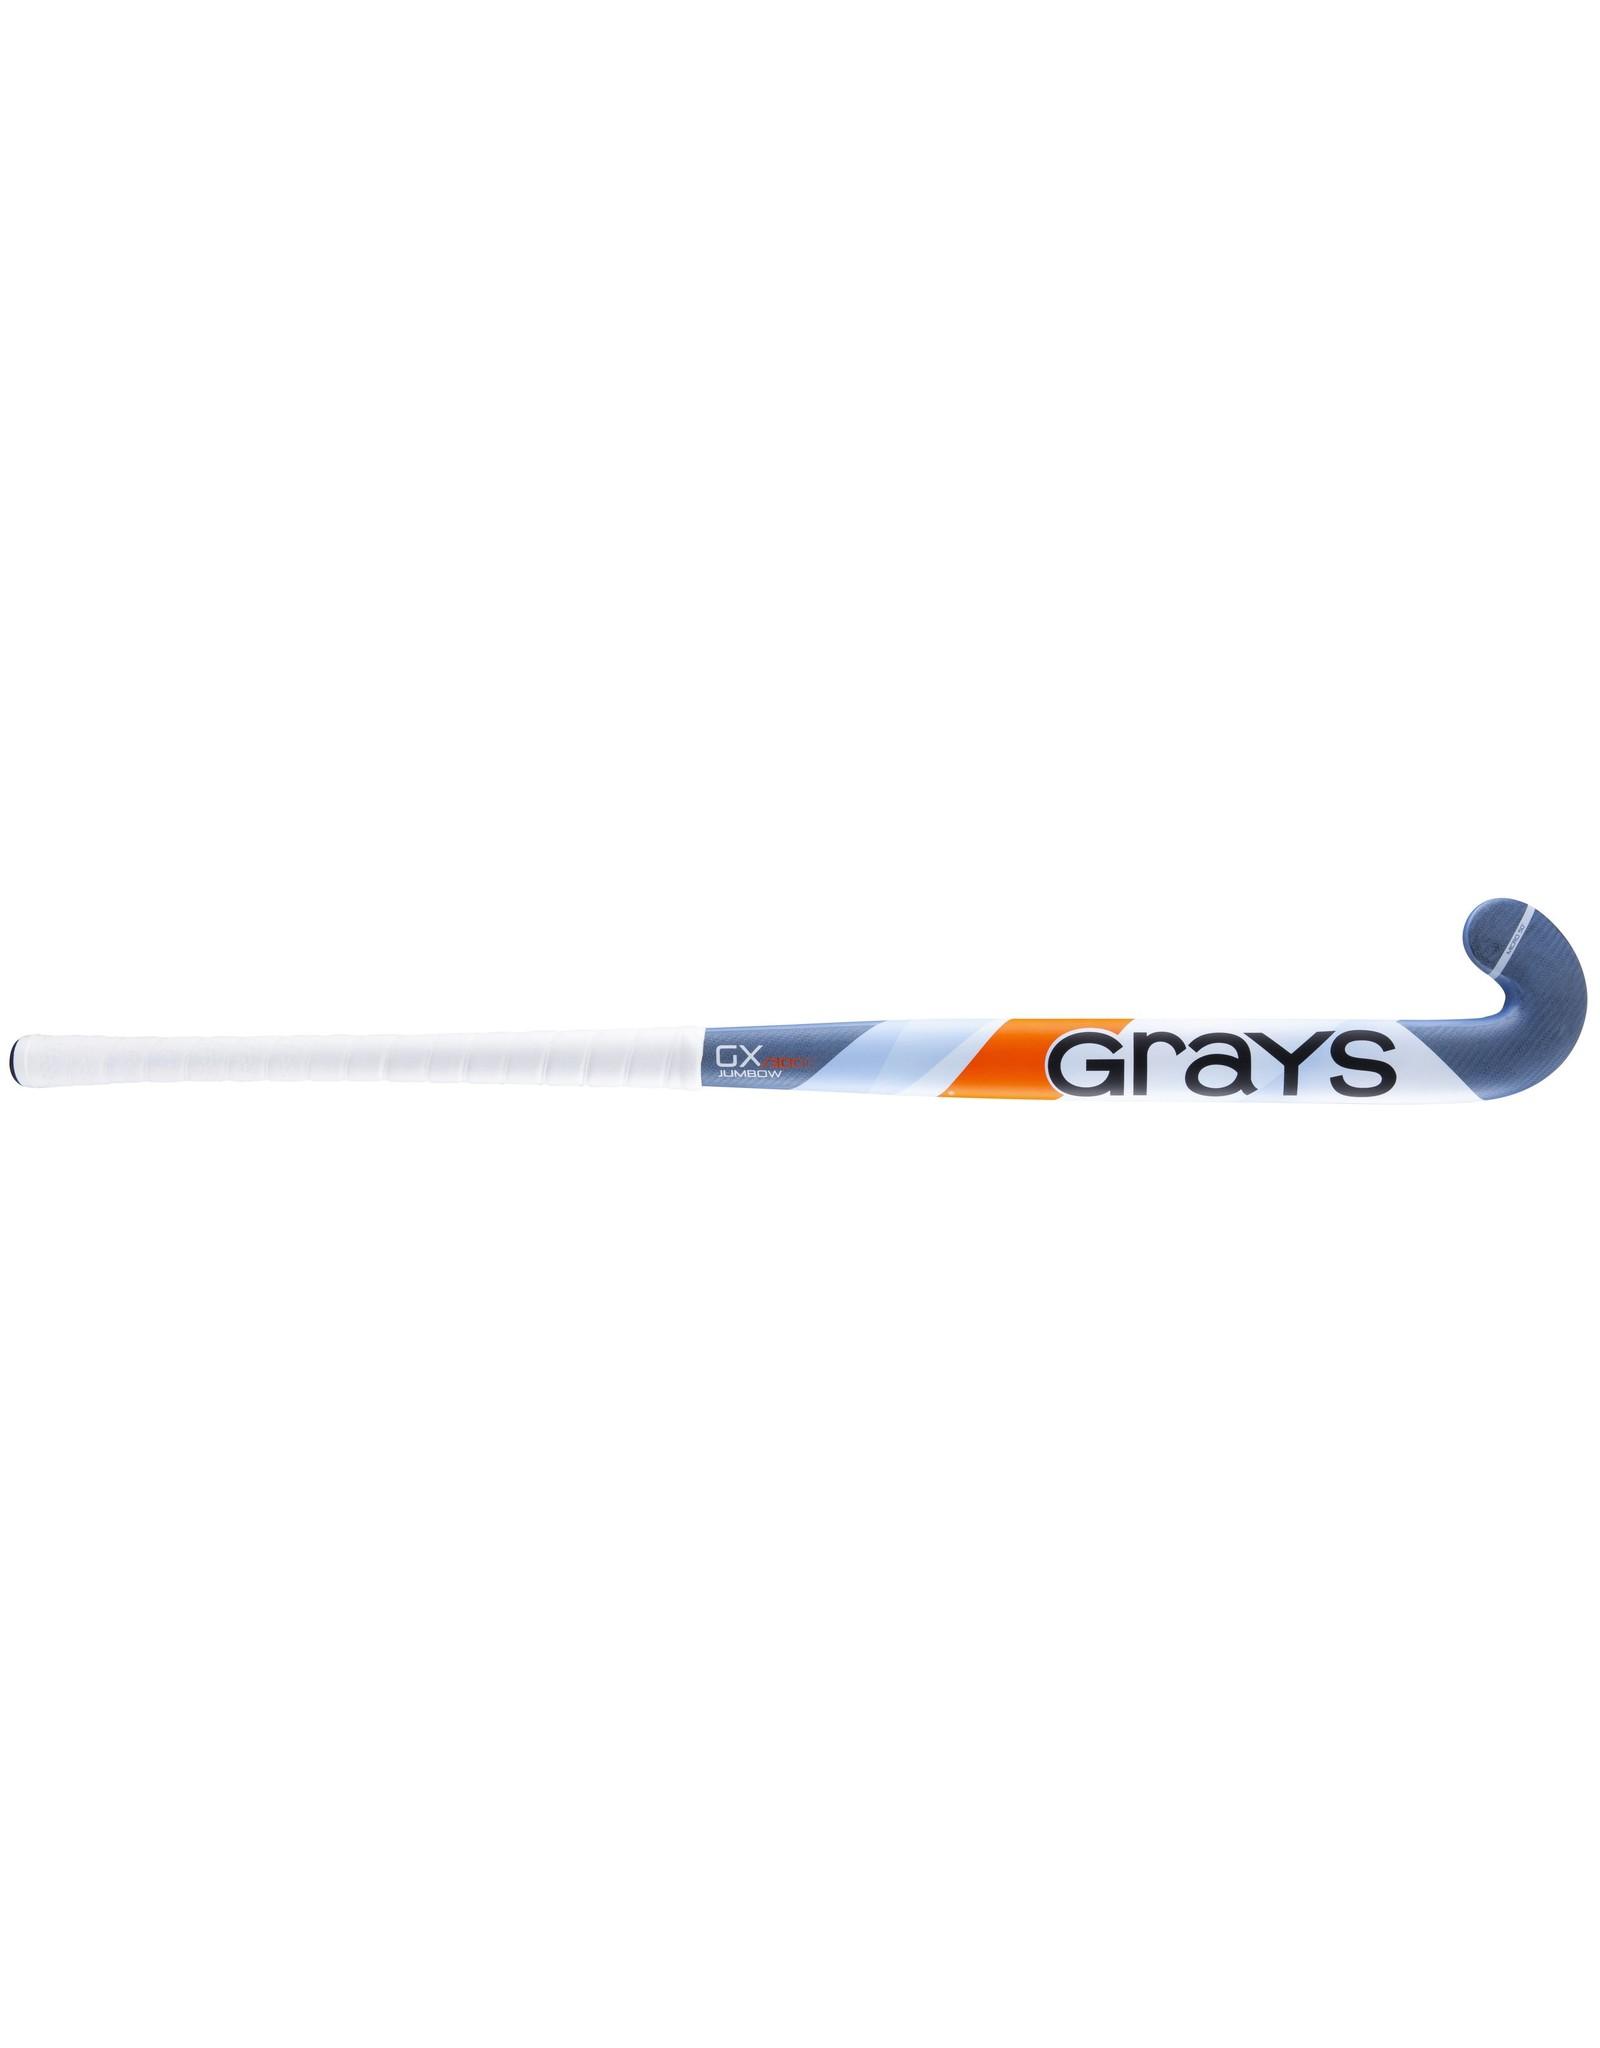 Grays STK GX3000 UB MC ICE BL